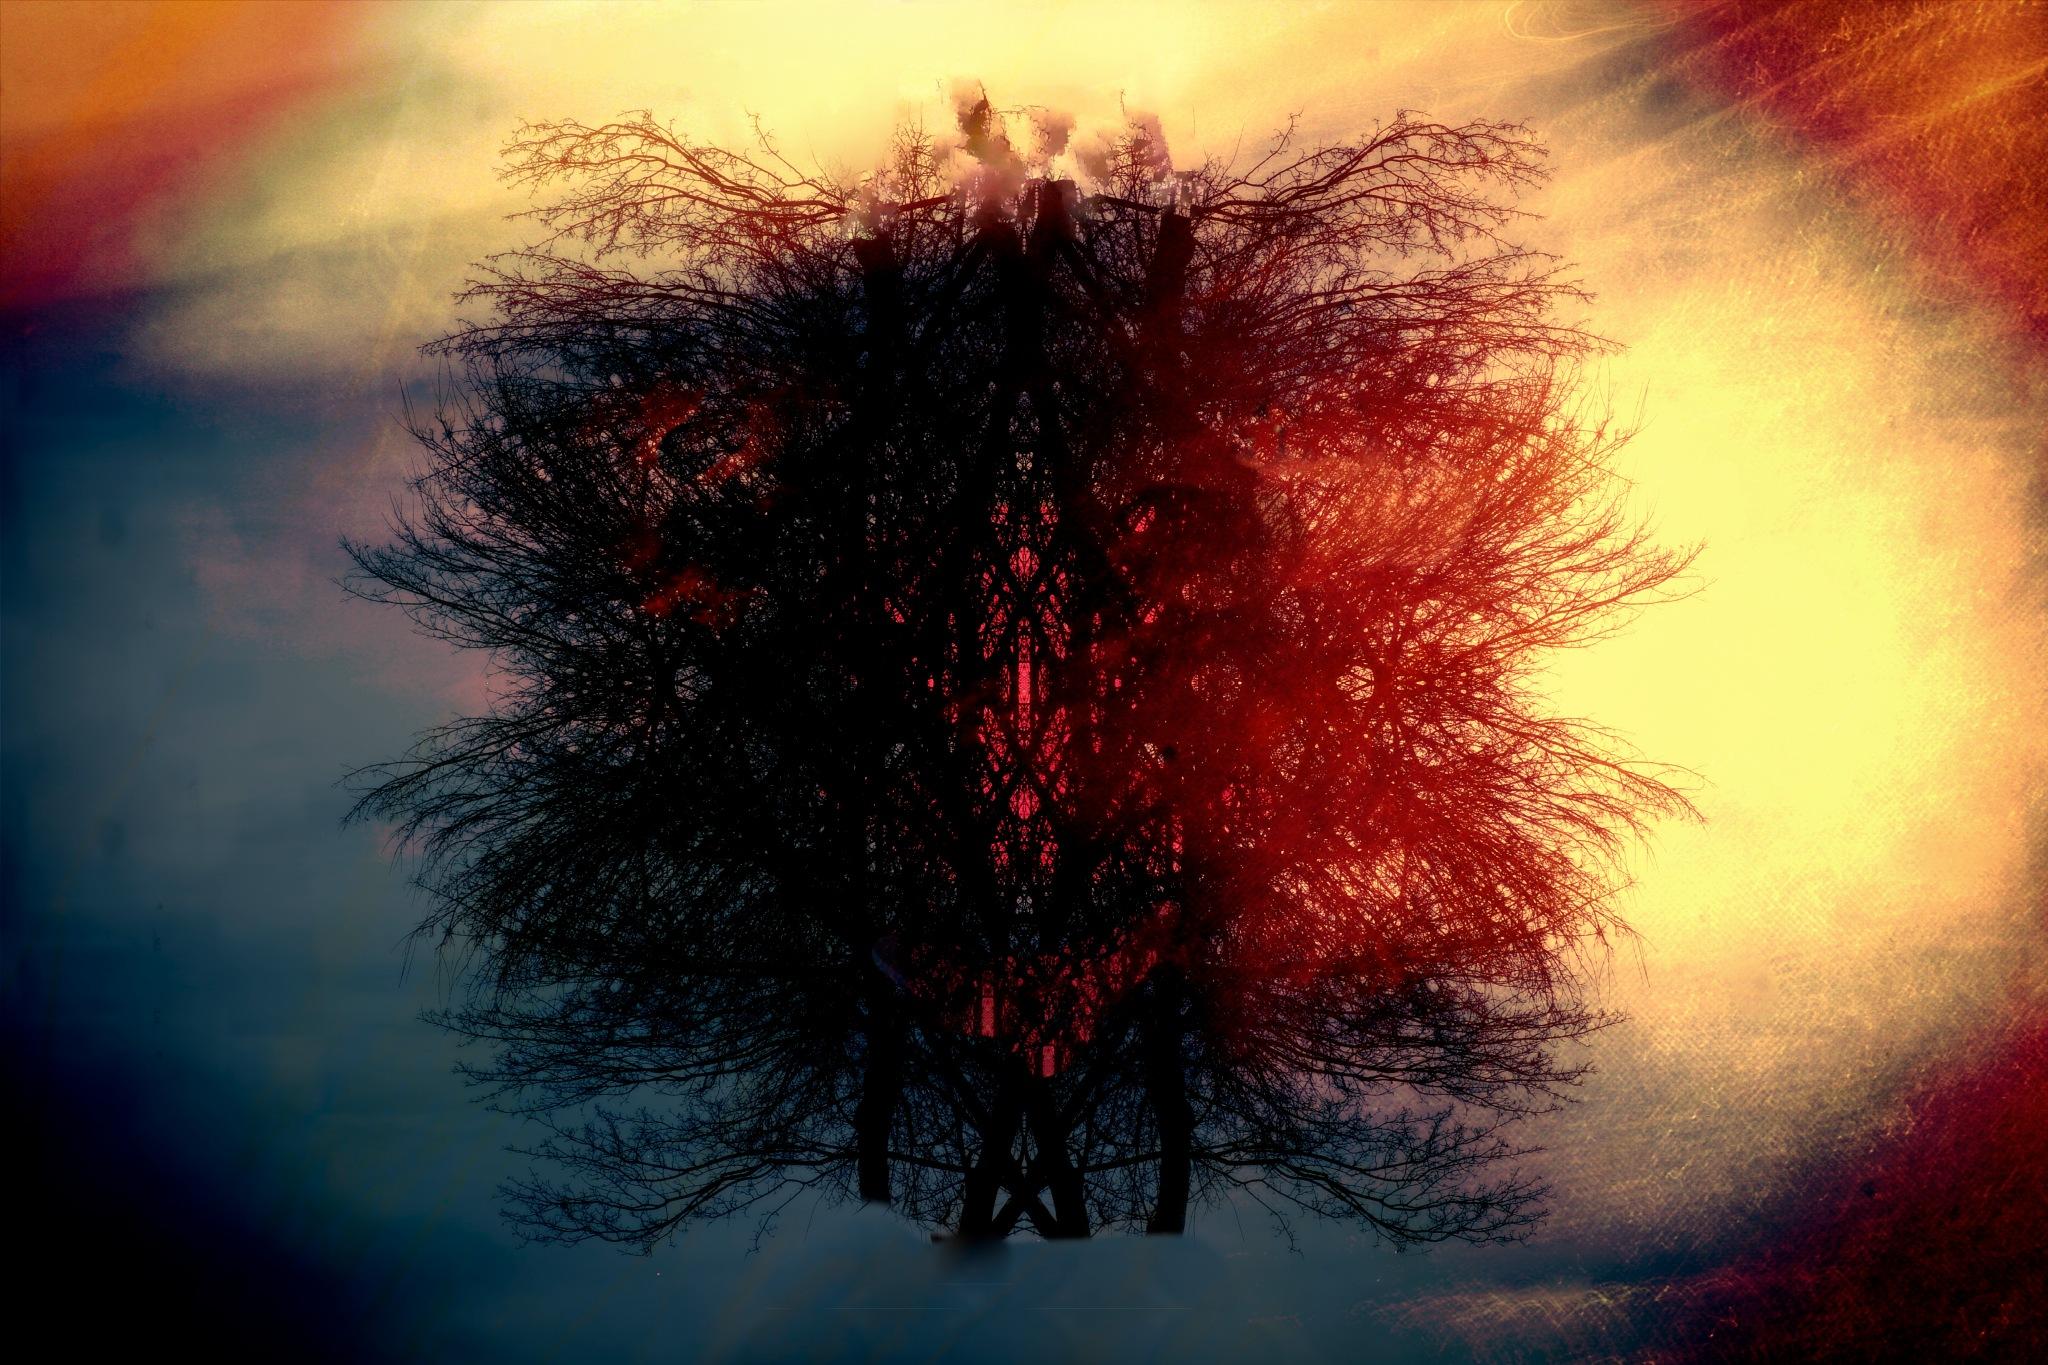 The Magic Tree by tonyjoe.gardner